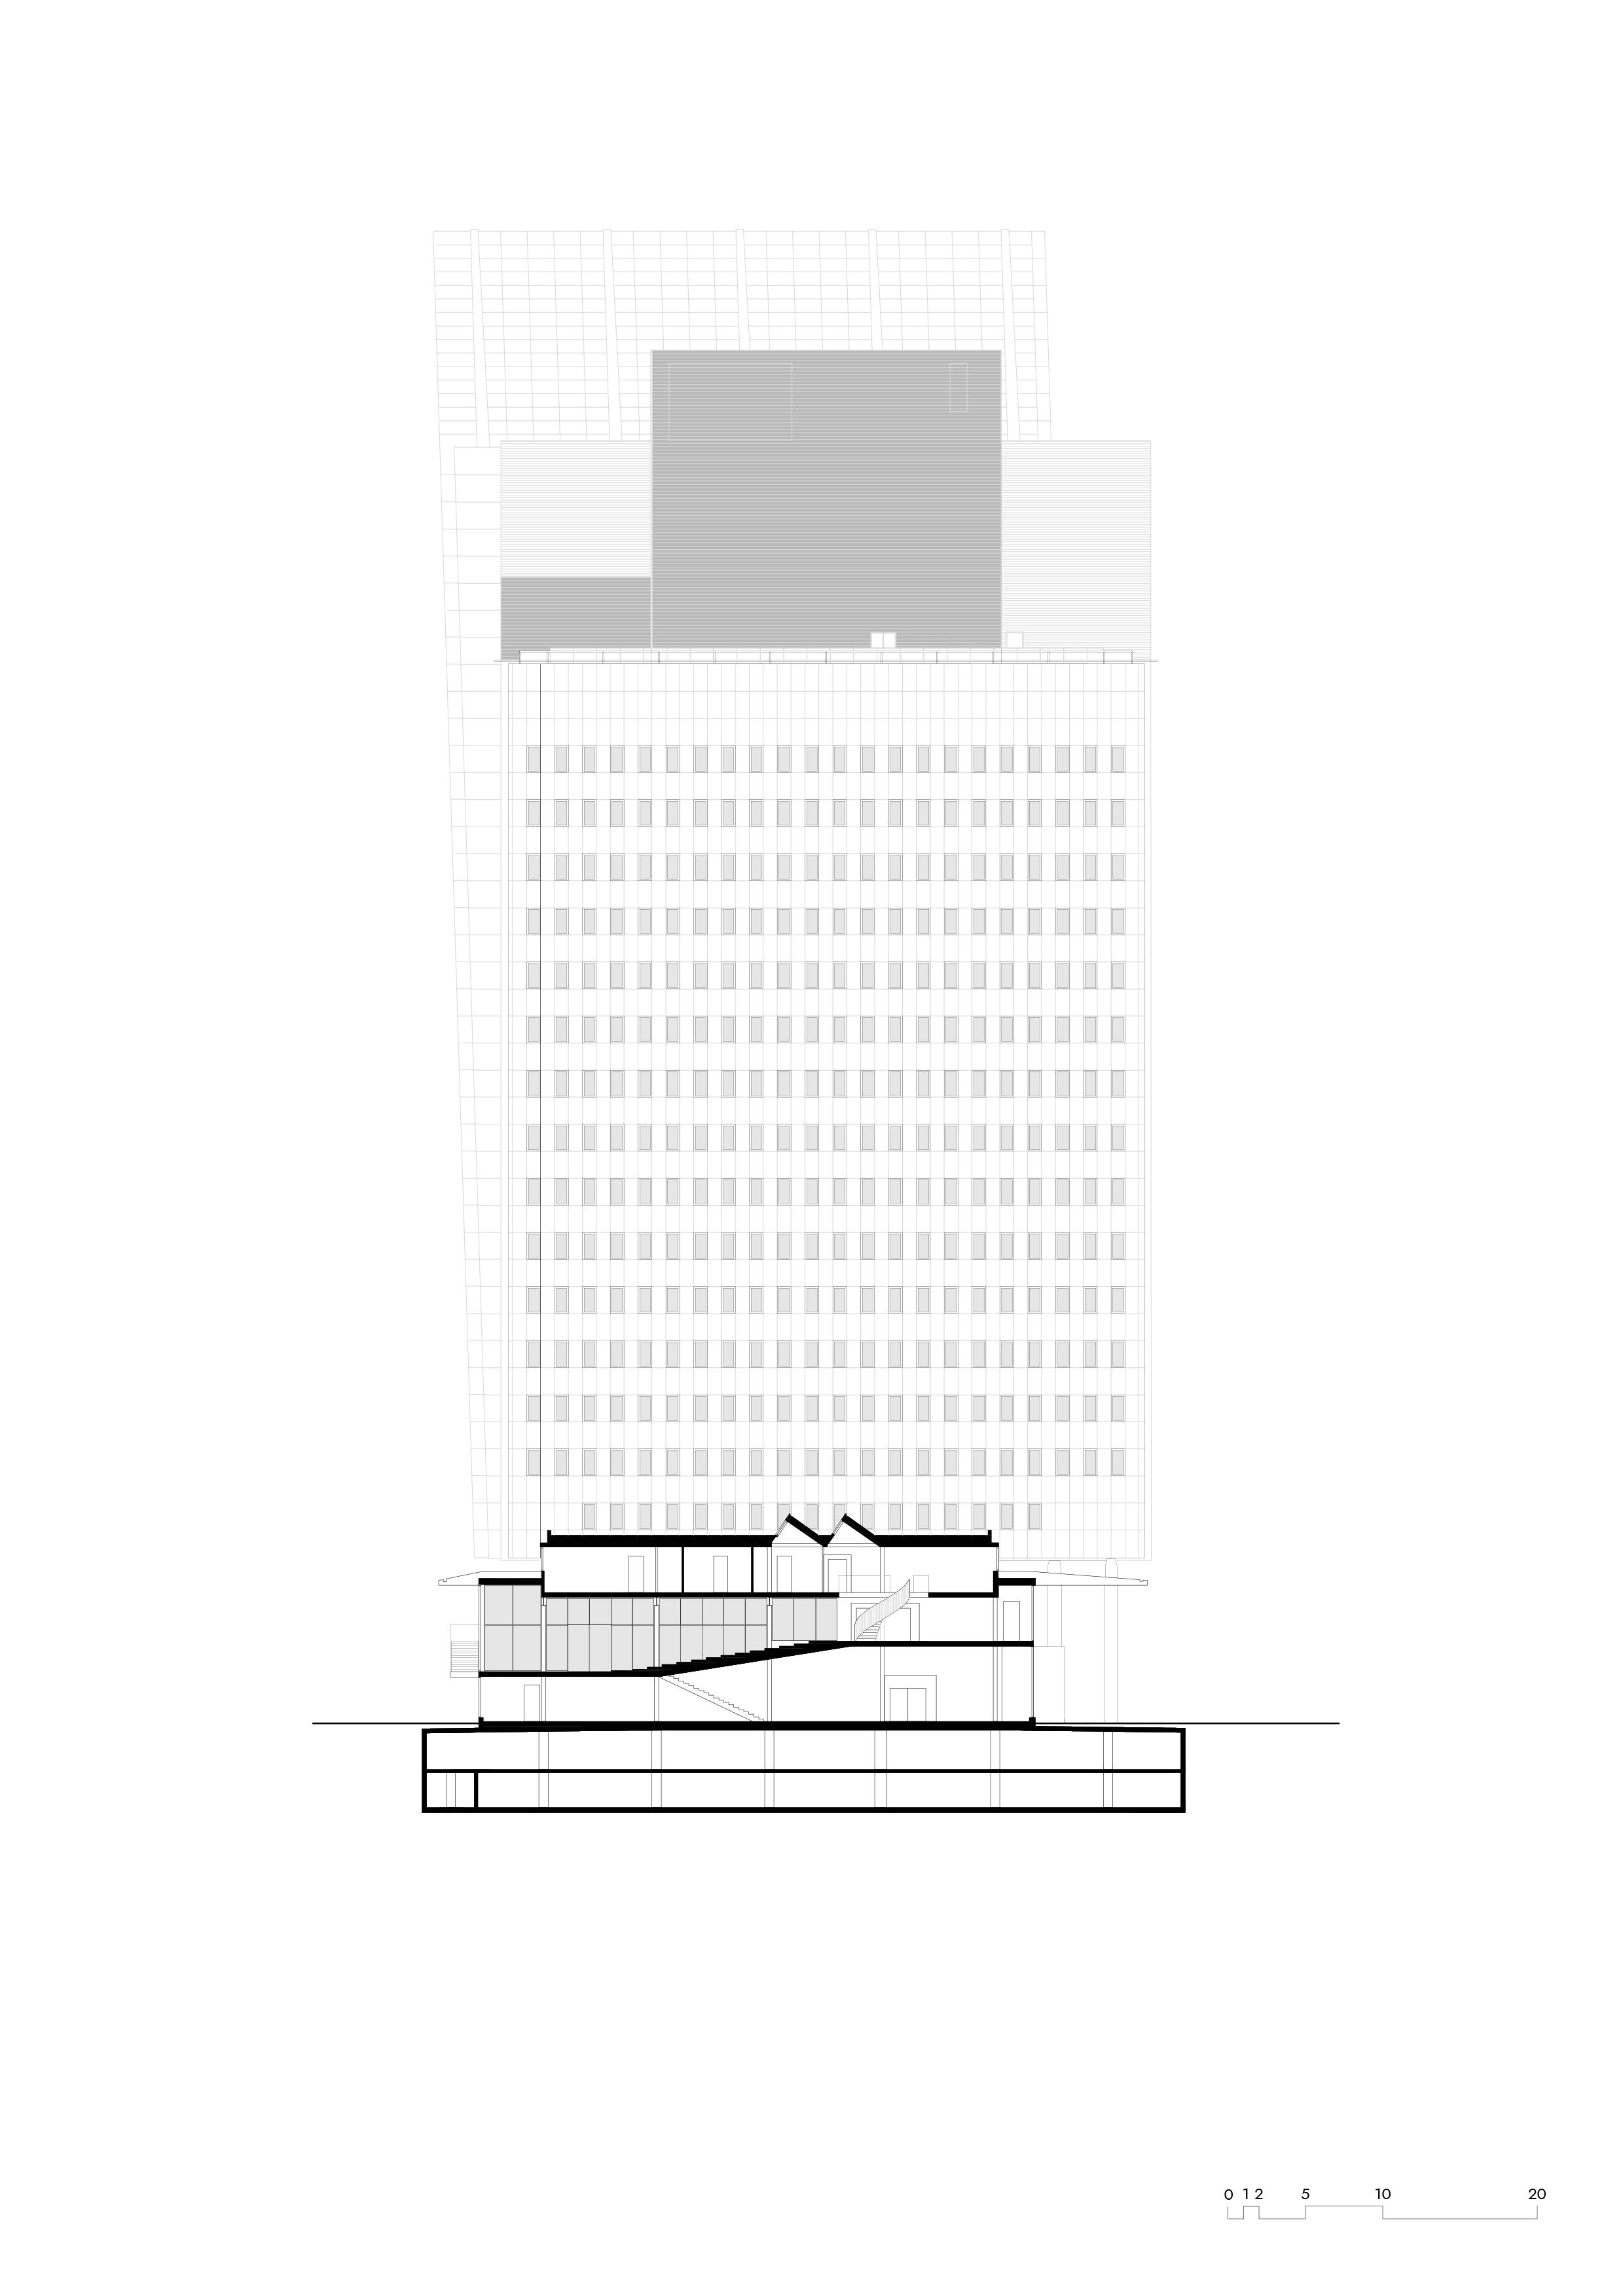 <p>KPN hoofdkantoor &#8211; dwarsdoorsnede</p>